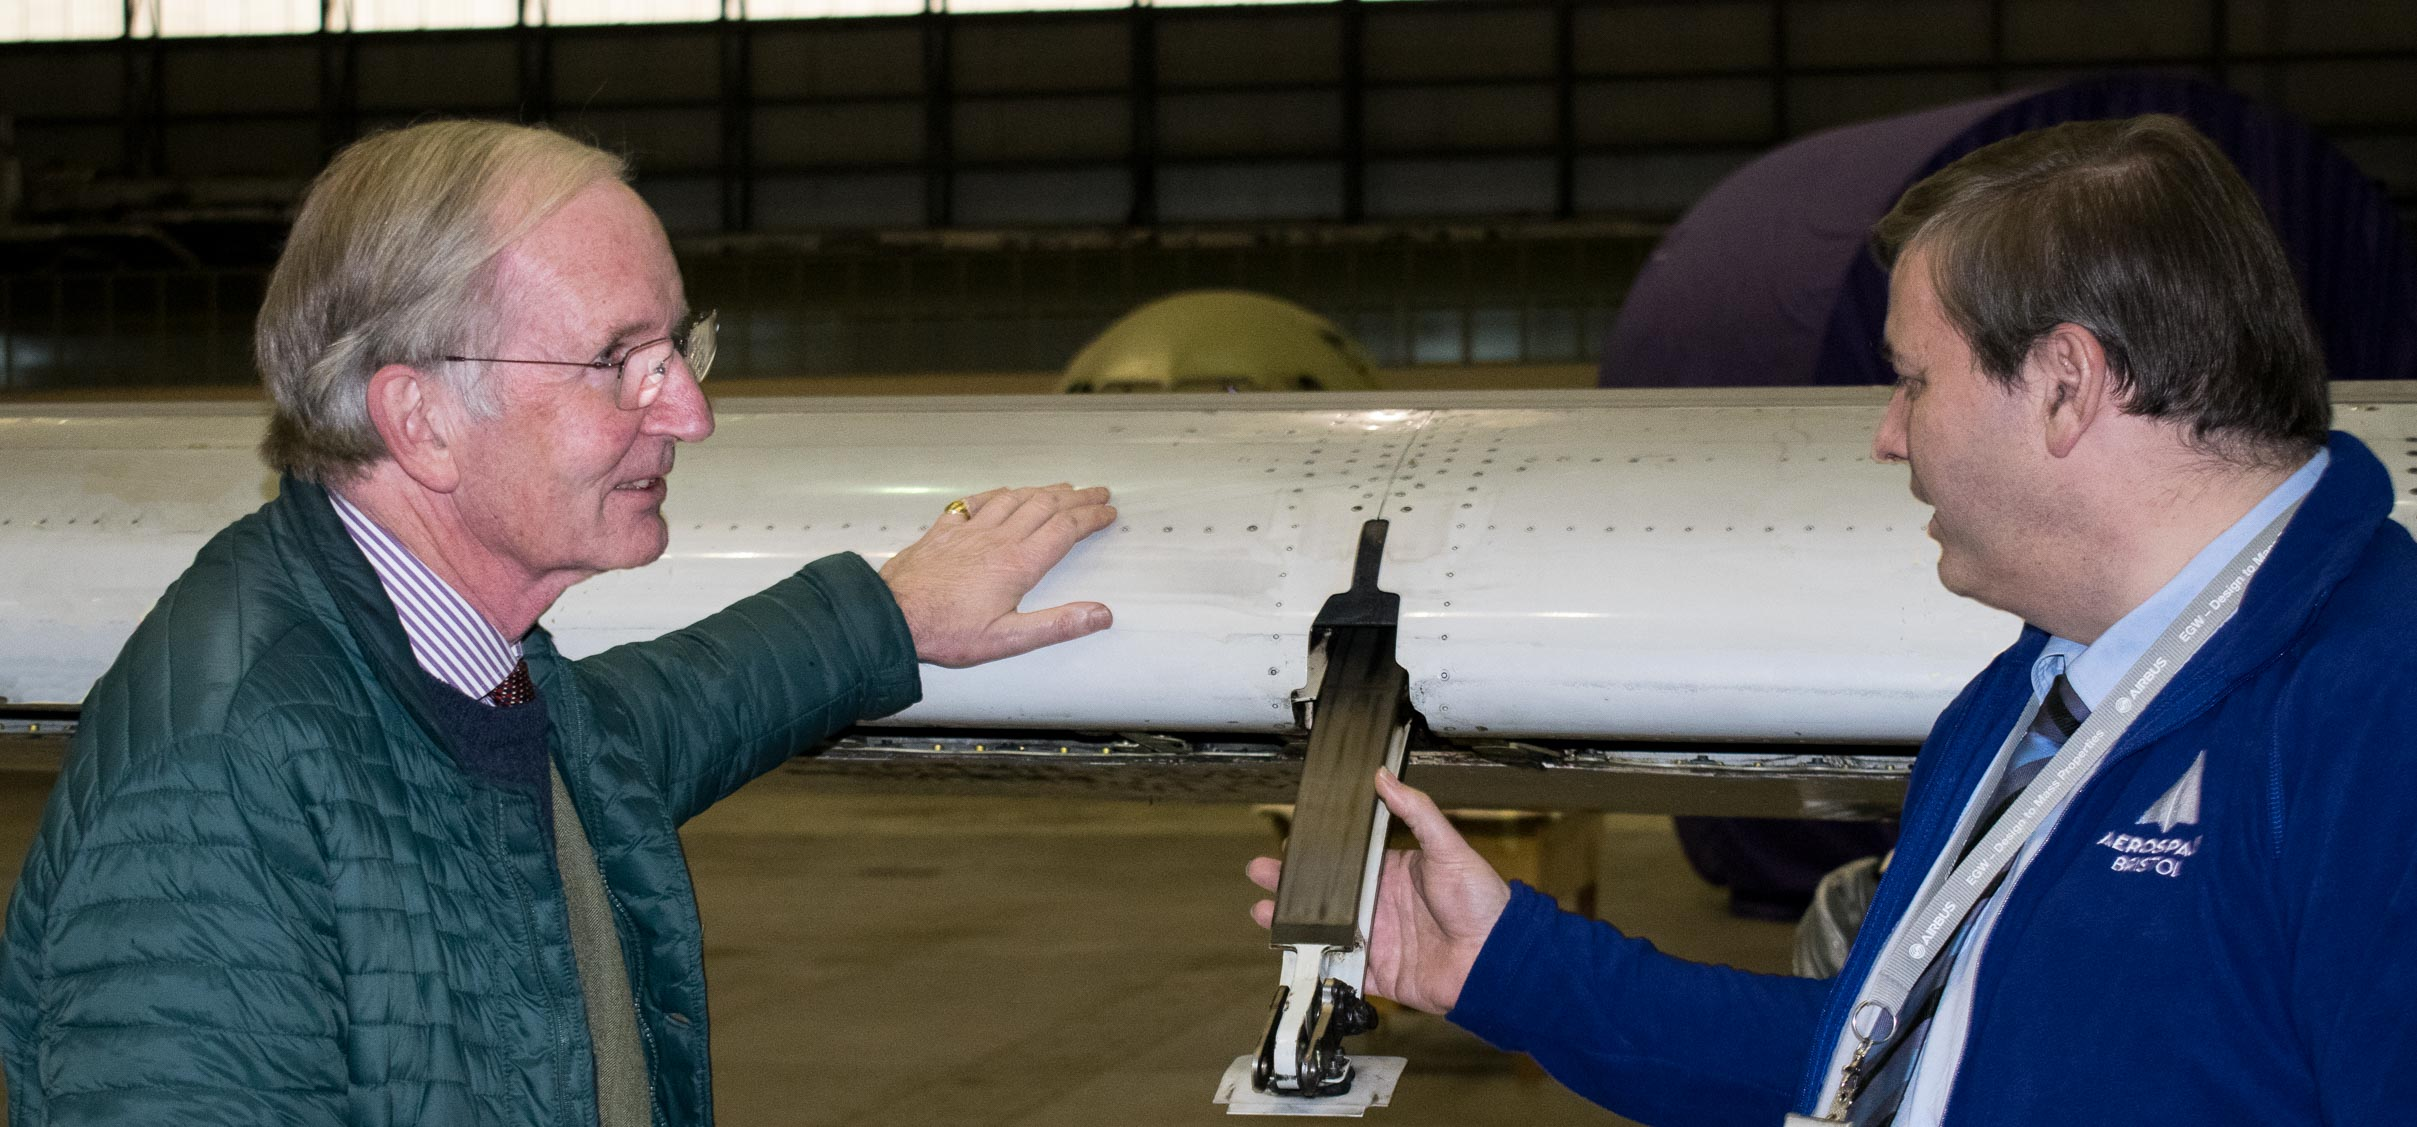 Sir George White meets with an Aerospace Bristol volunteer